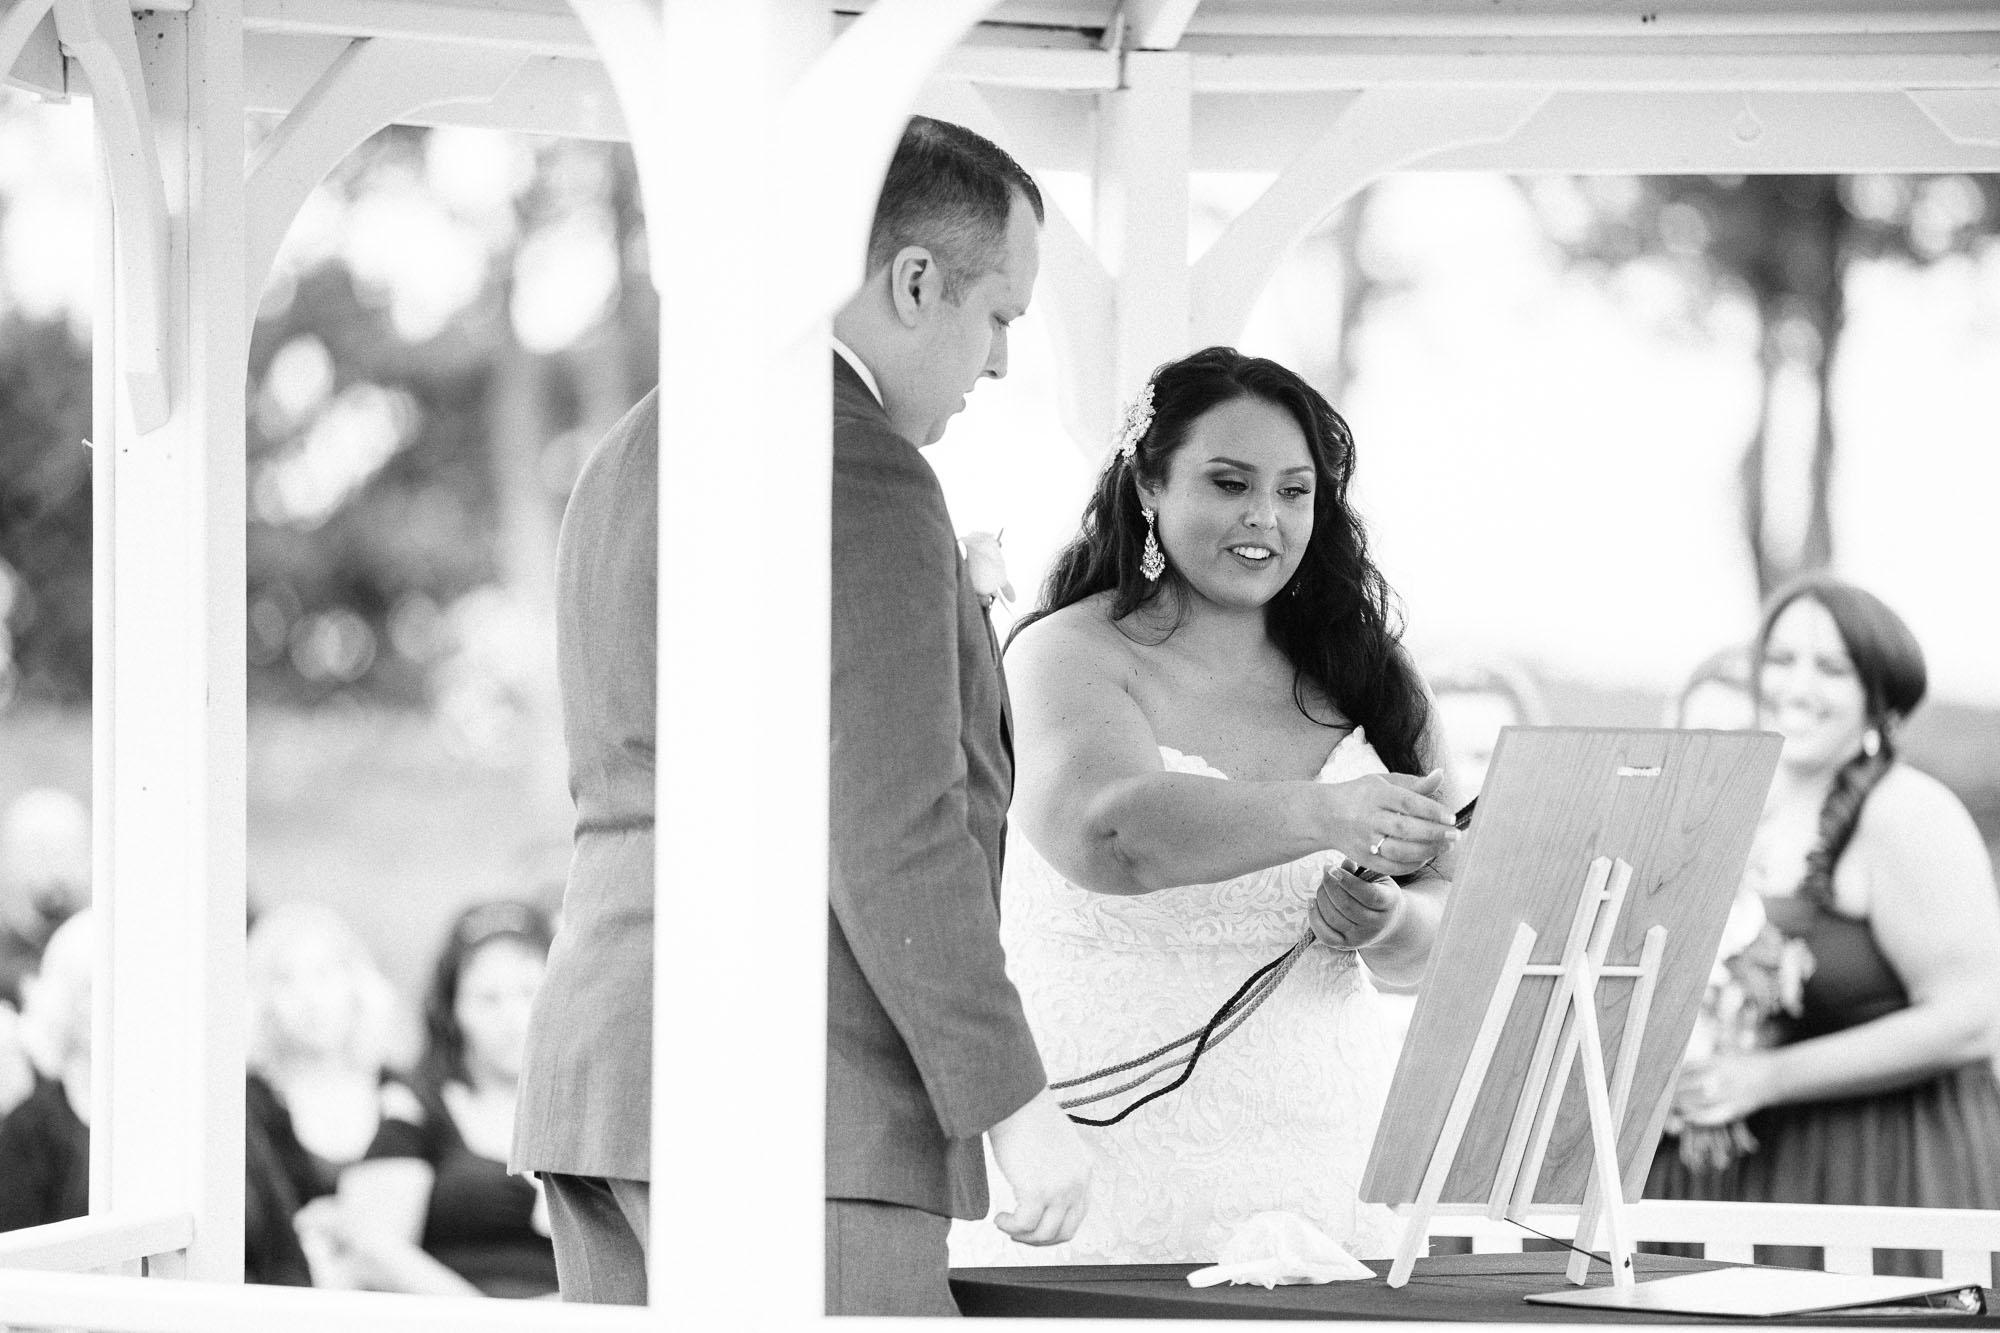 stonhedge-country-club-wedding-8331.jpg